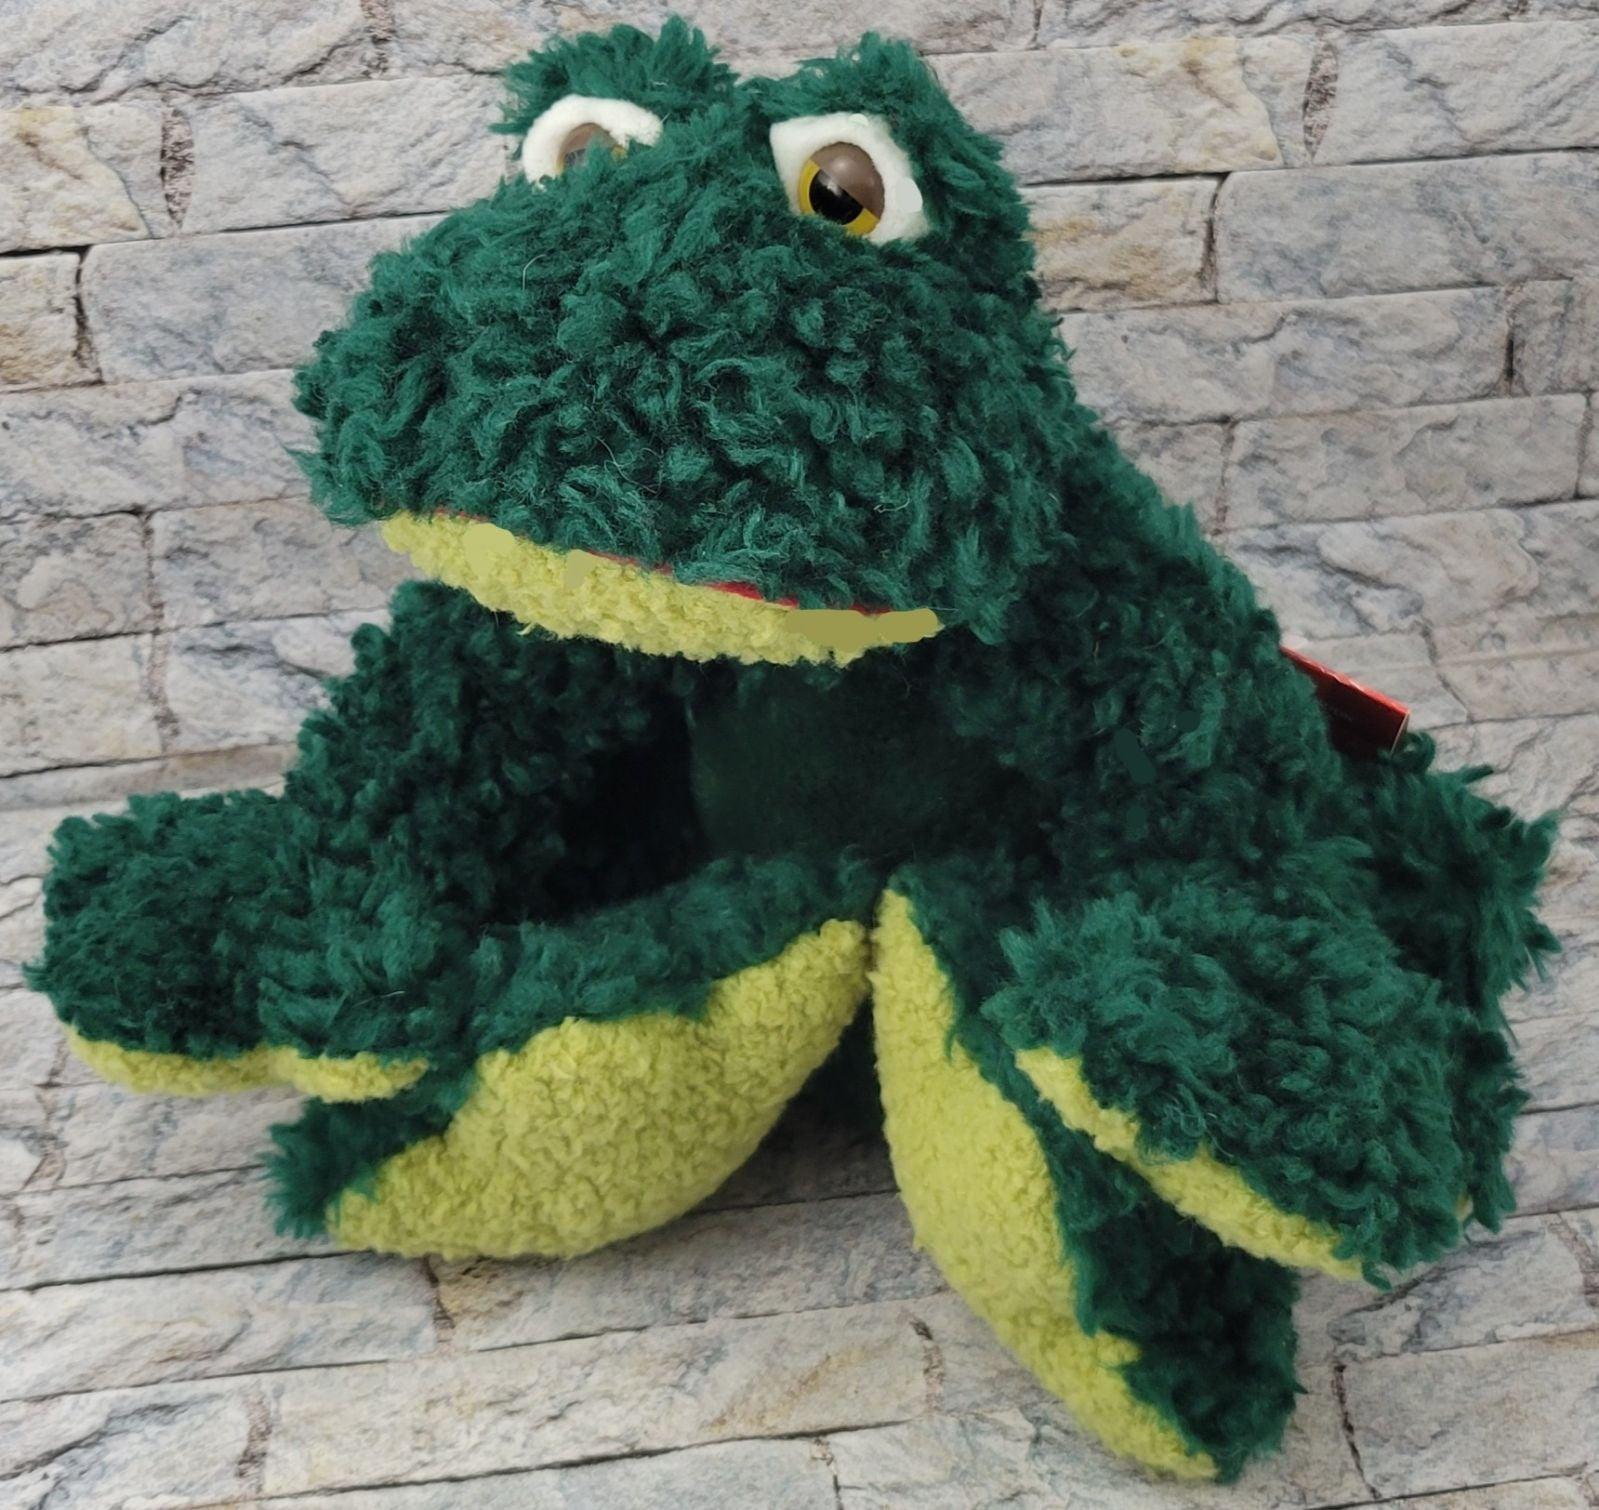 RUSS Frumps Green Frog NEW Stuffed PLUSH